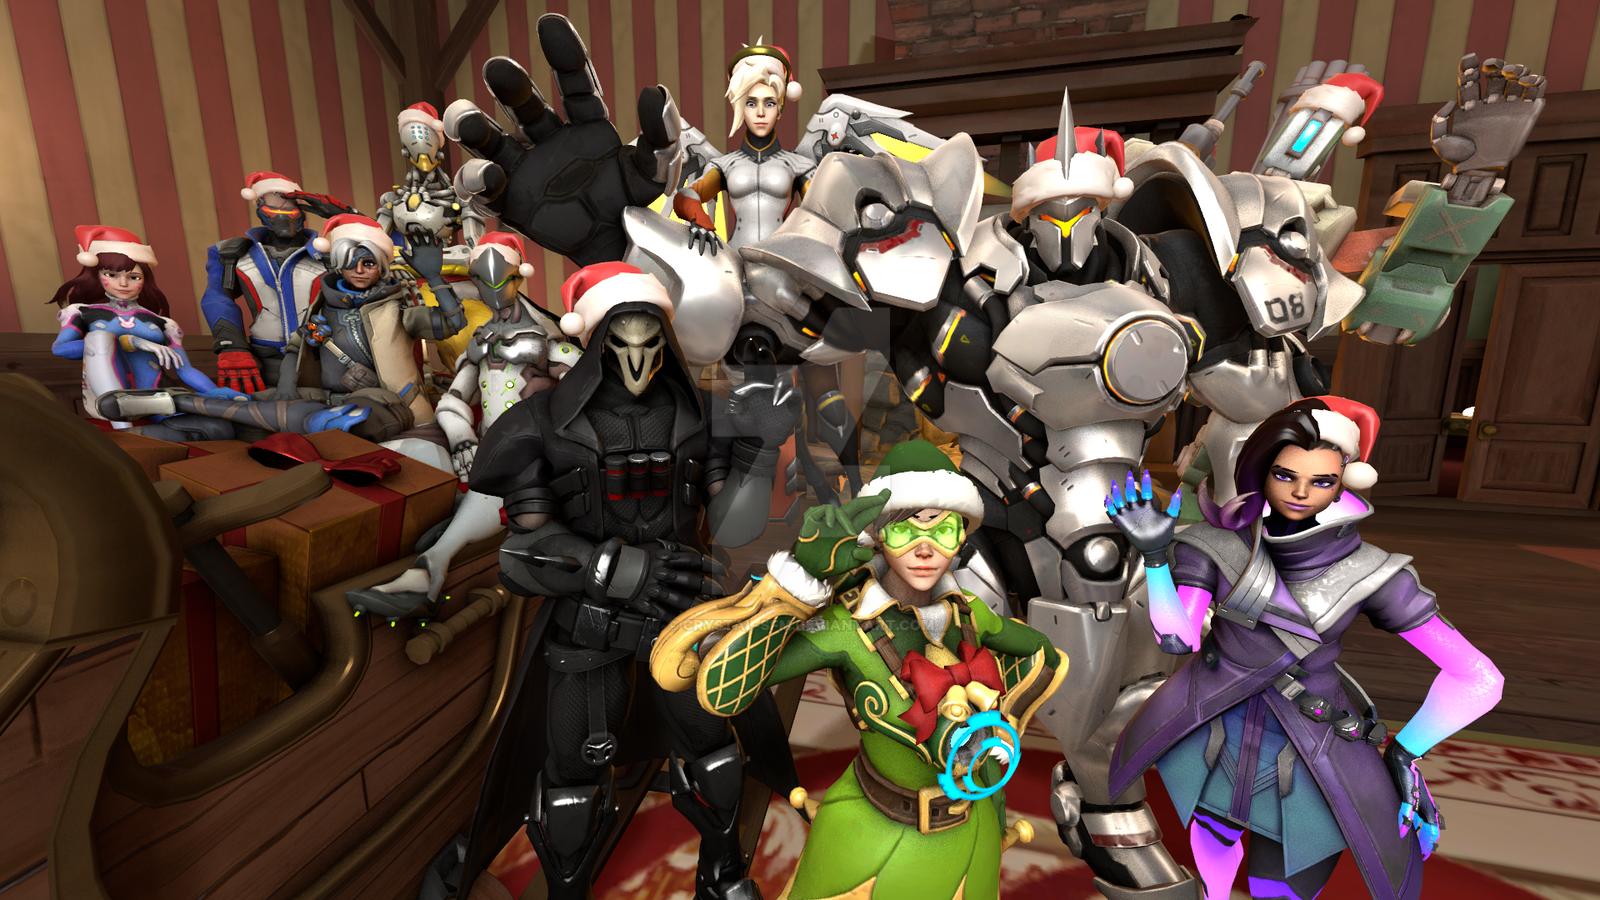 Sfm overwatch 2017 merry christmas by crystal sfm on - Overwatch christmas wallpaper ...